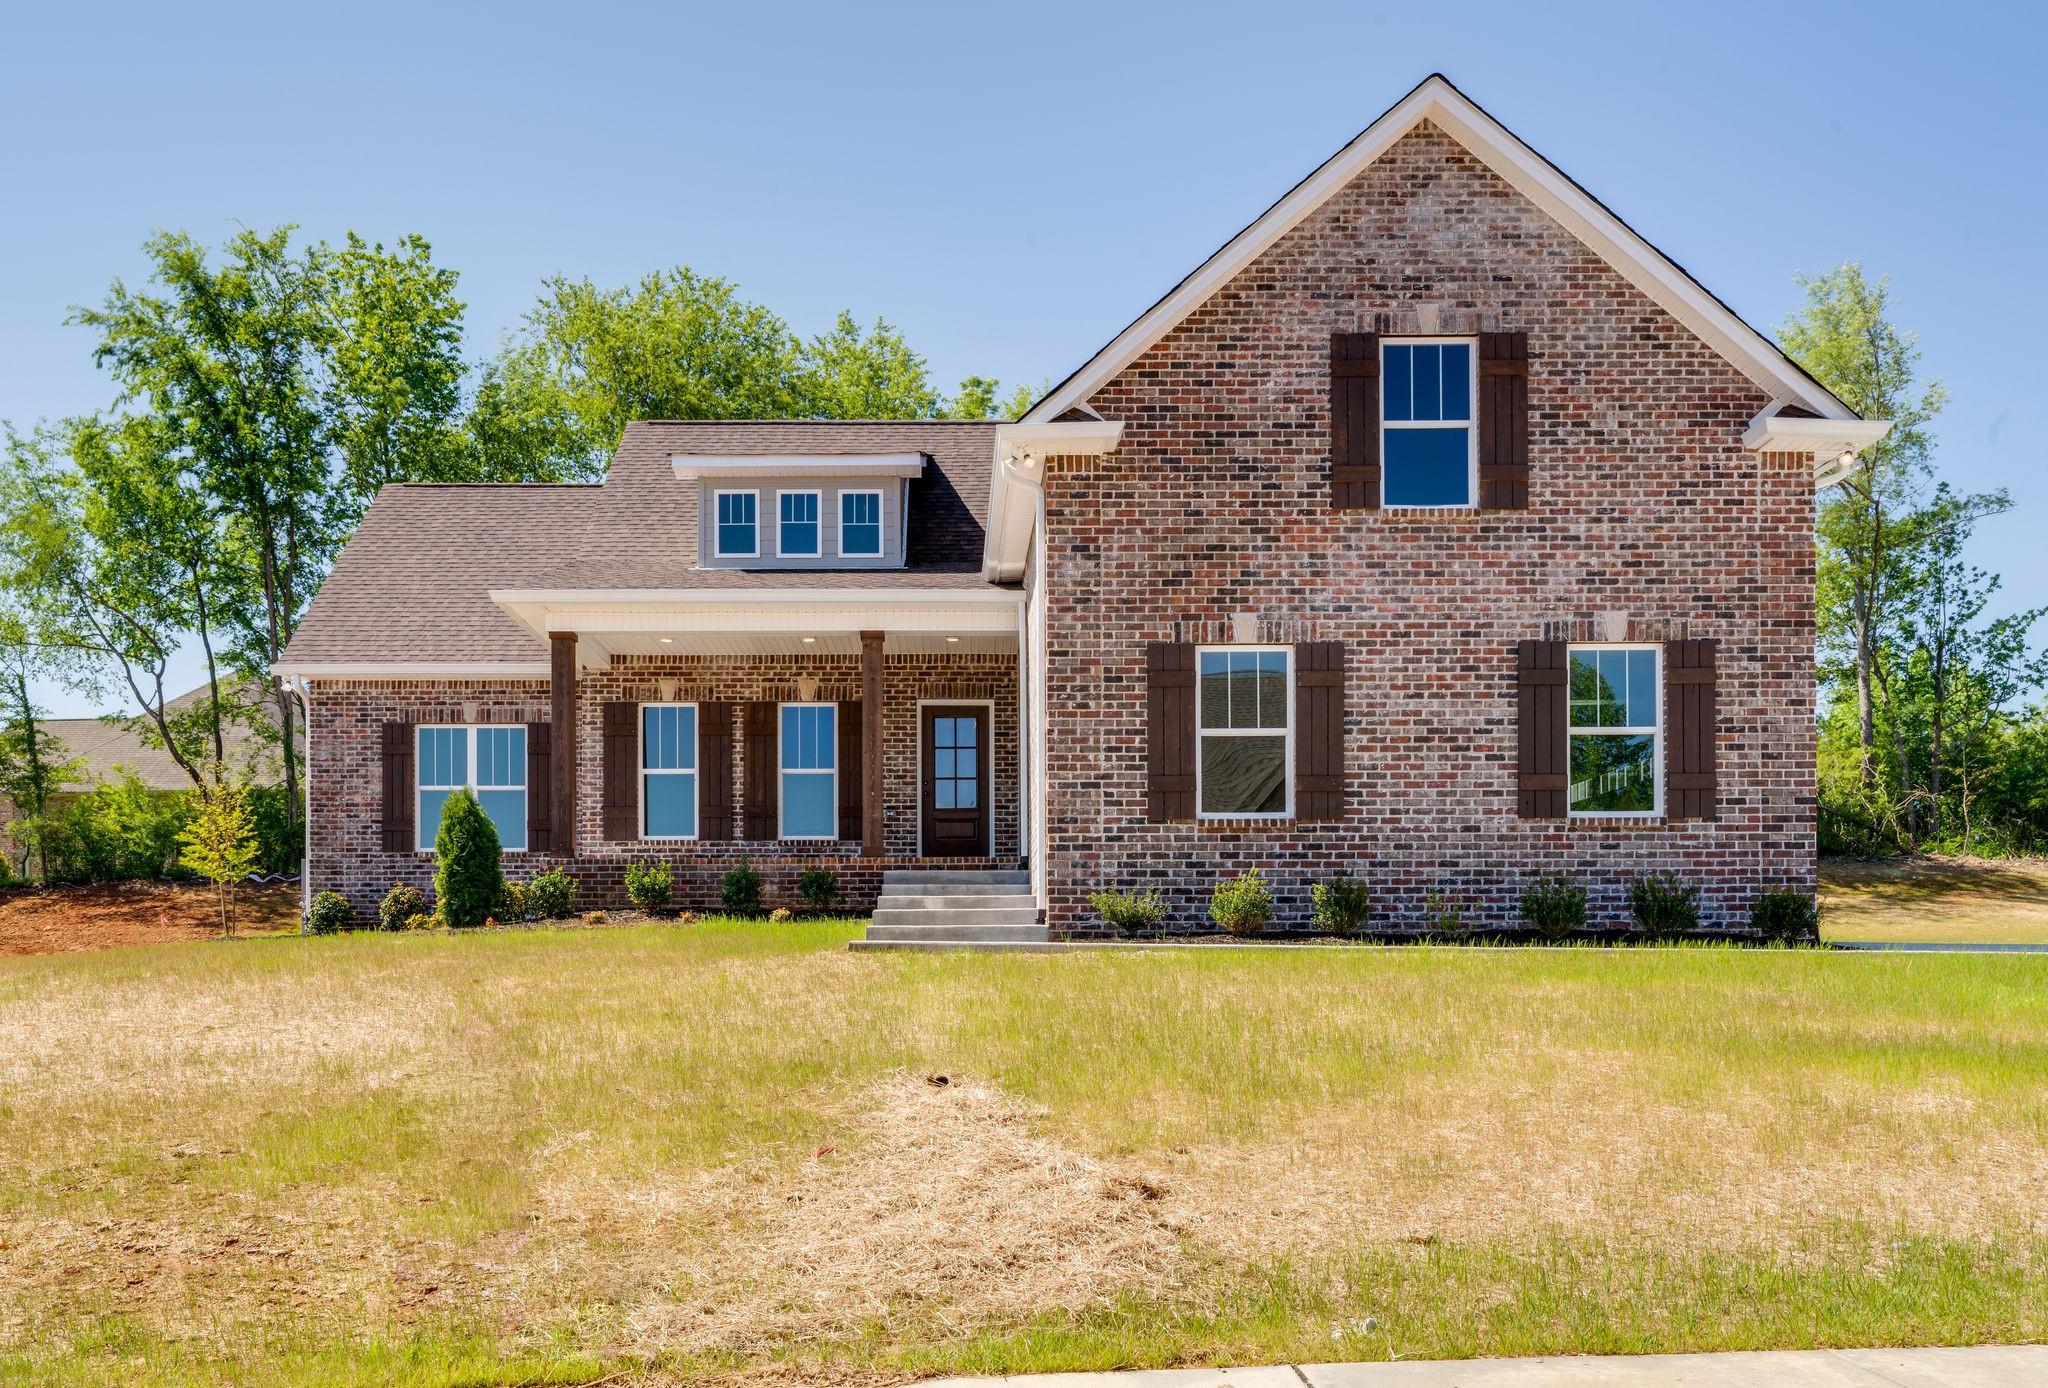 6036 W Mayflower Ct, Greenbrier, TN 37073 - Greenbrier, TN real estate listing